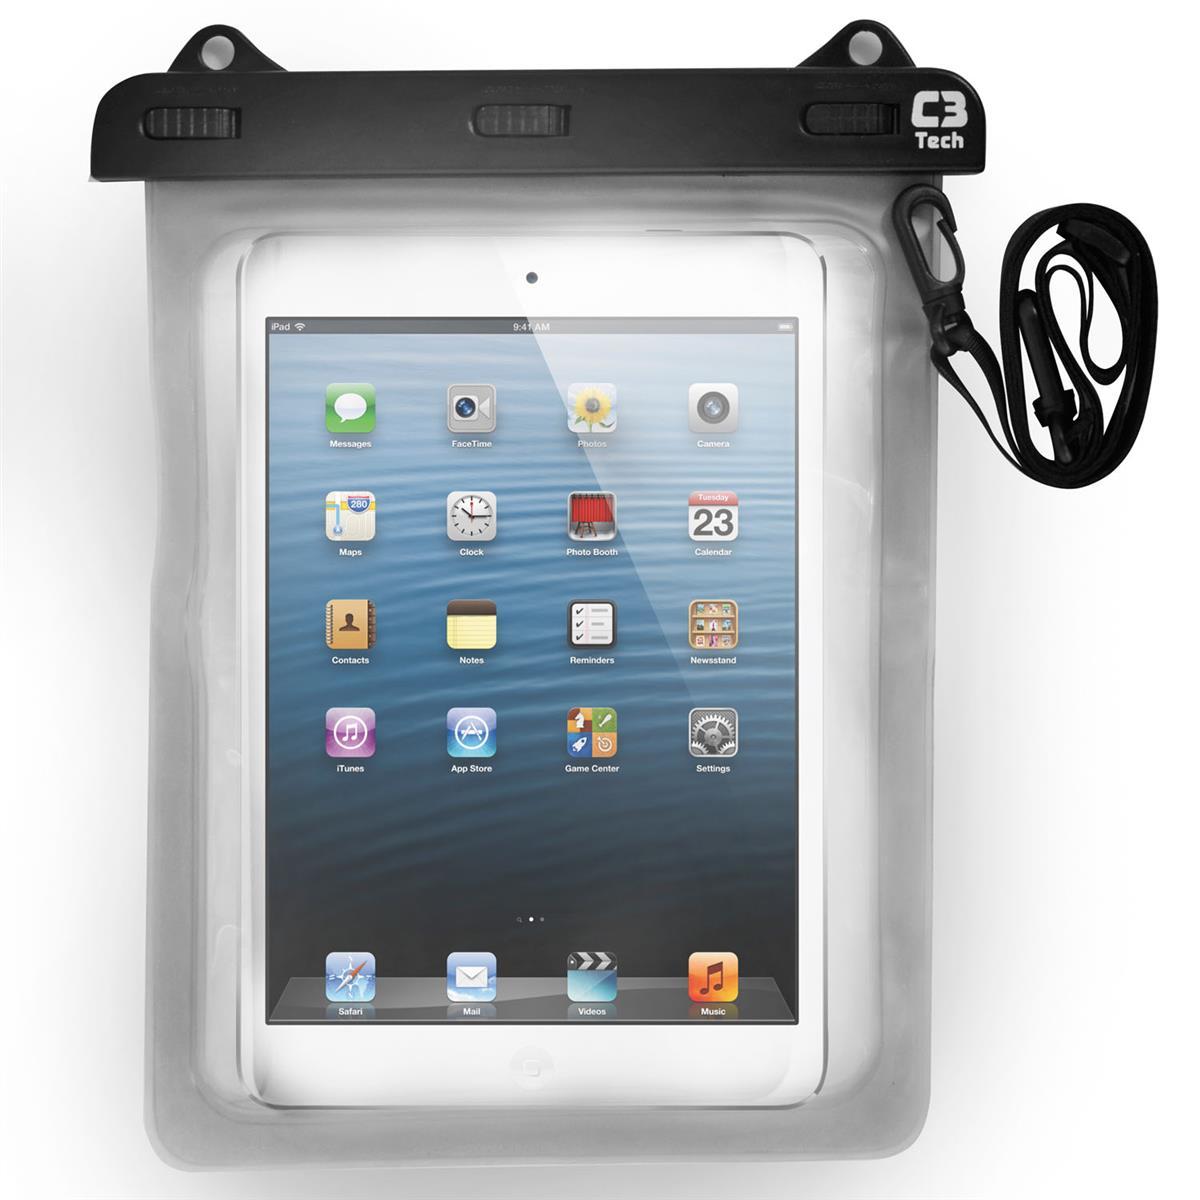 Case Protetor Universal Para Tablet Wpb - 003T C3 Tech